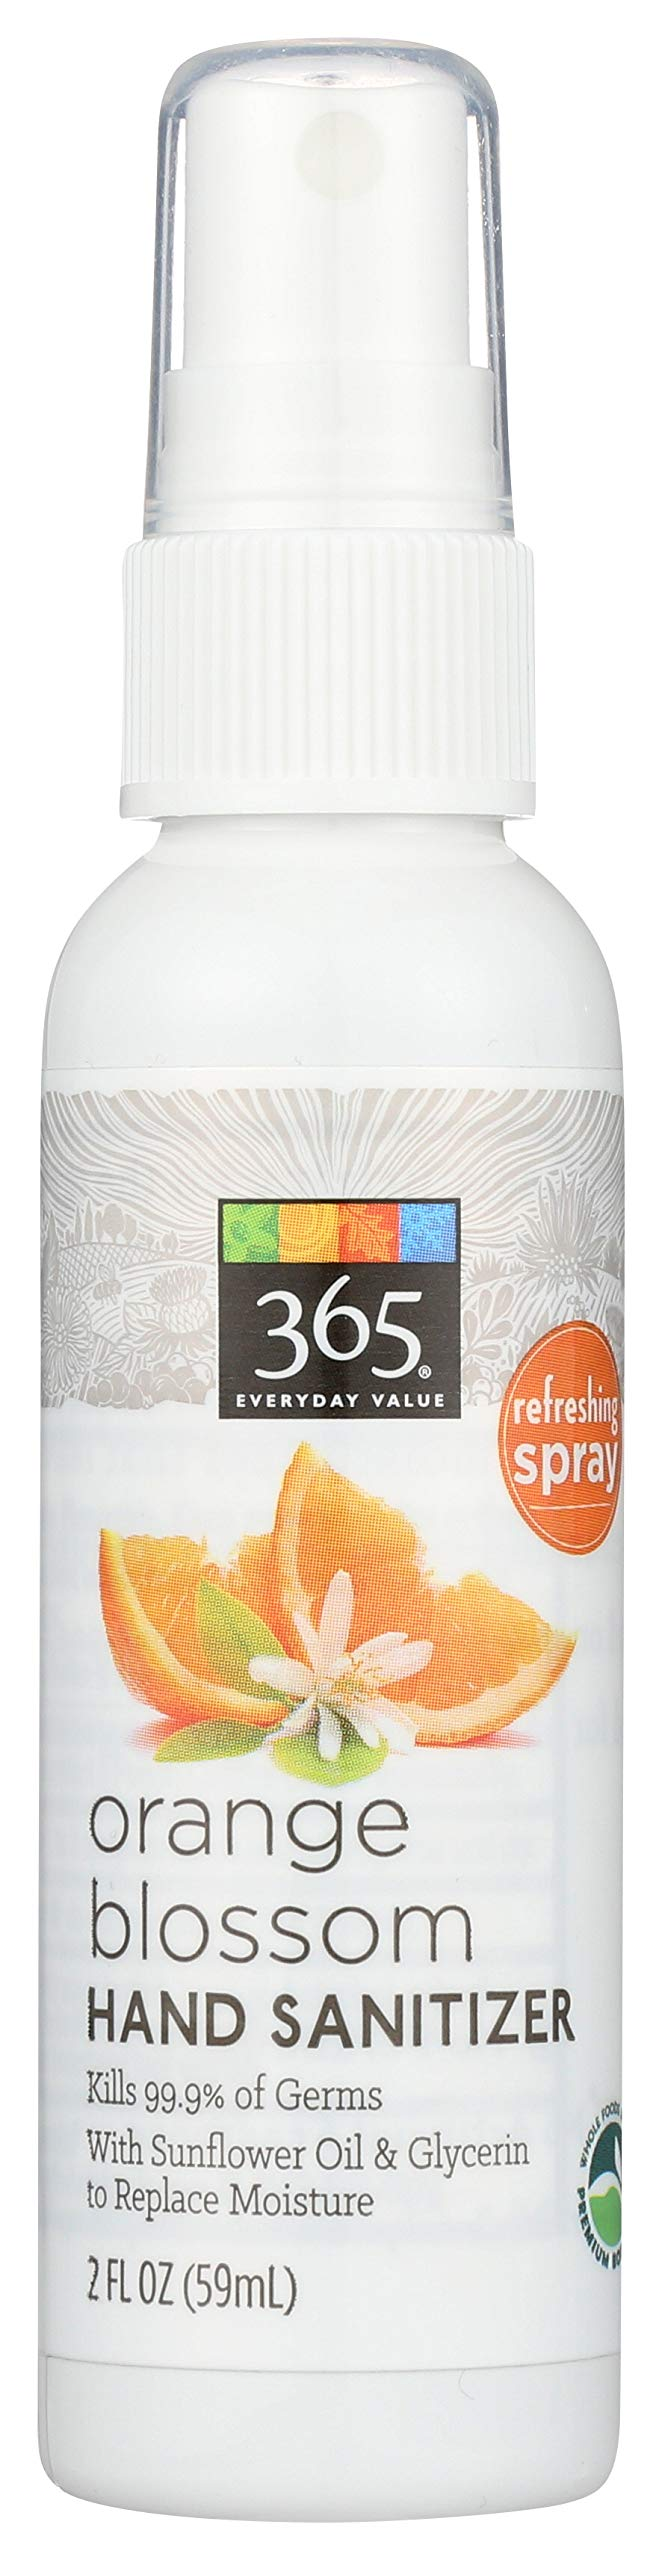 365 Everyday Value Lavender Hand Sanitizer Spray One 2oz Bottle